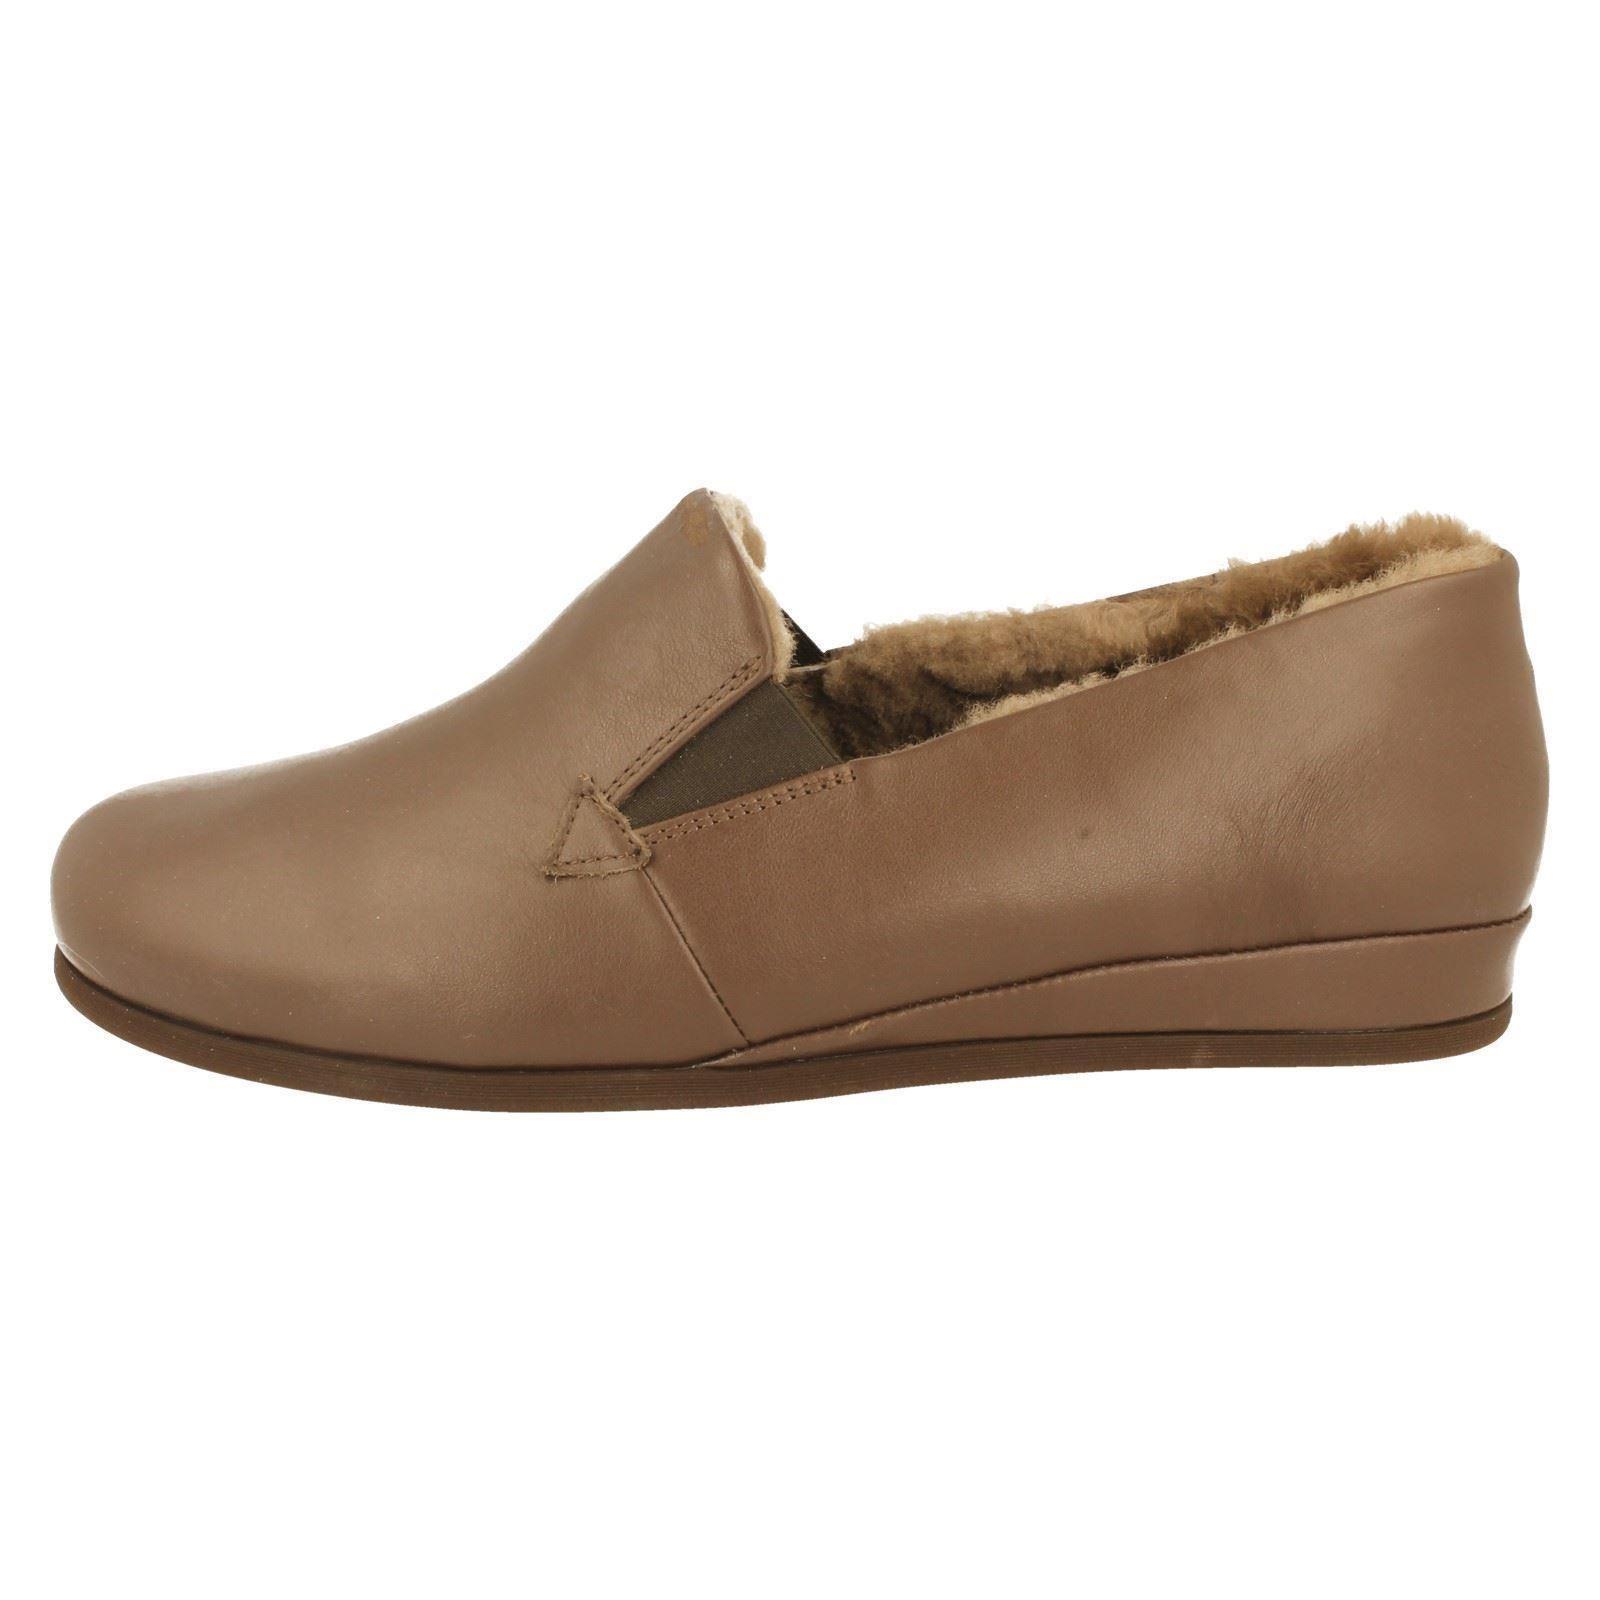 Pantofole da uomo Da Uomo Rohde Caldo Foderato Pantofole Stile 6420-w